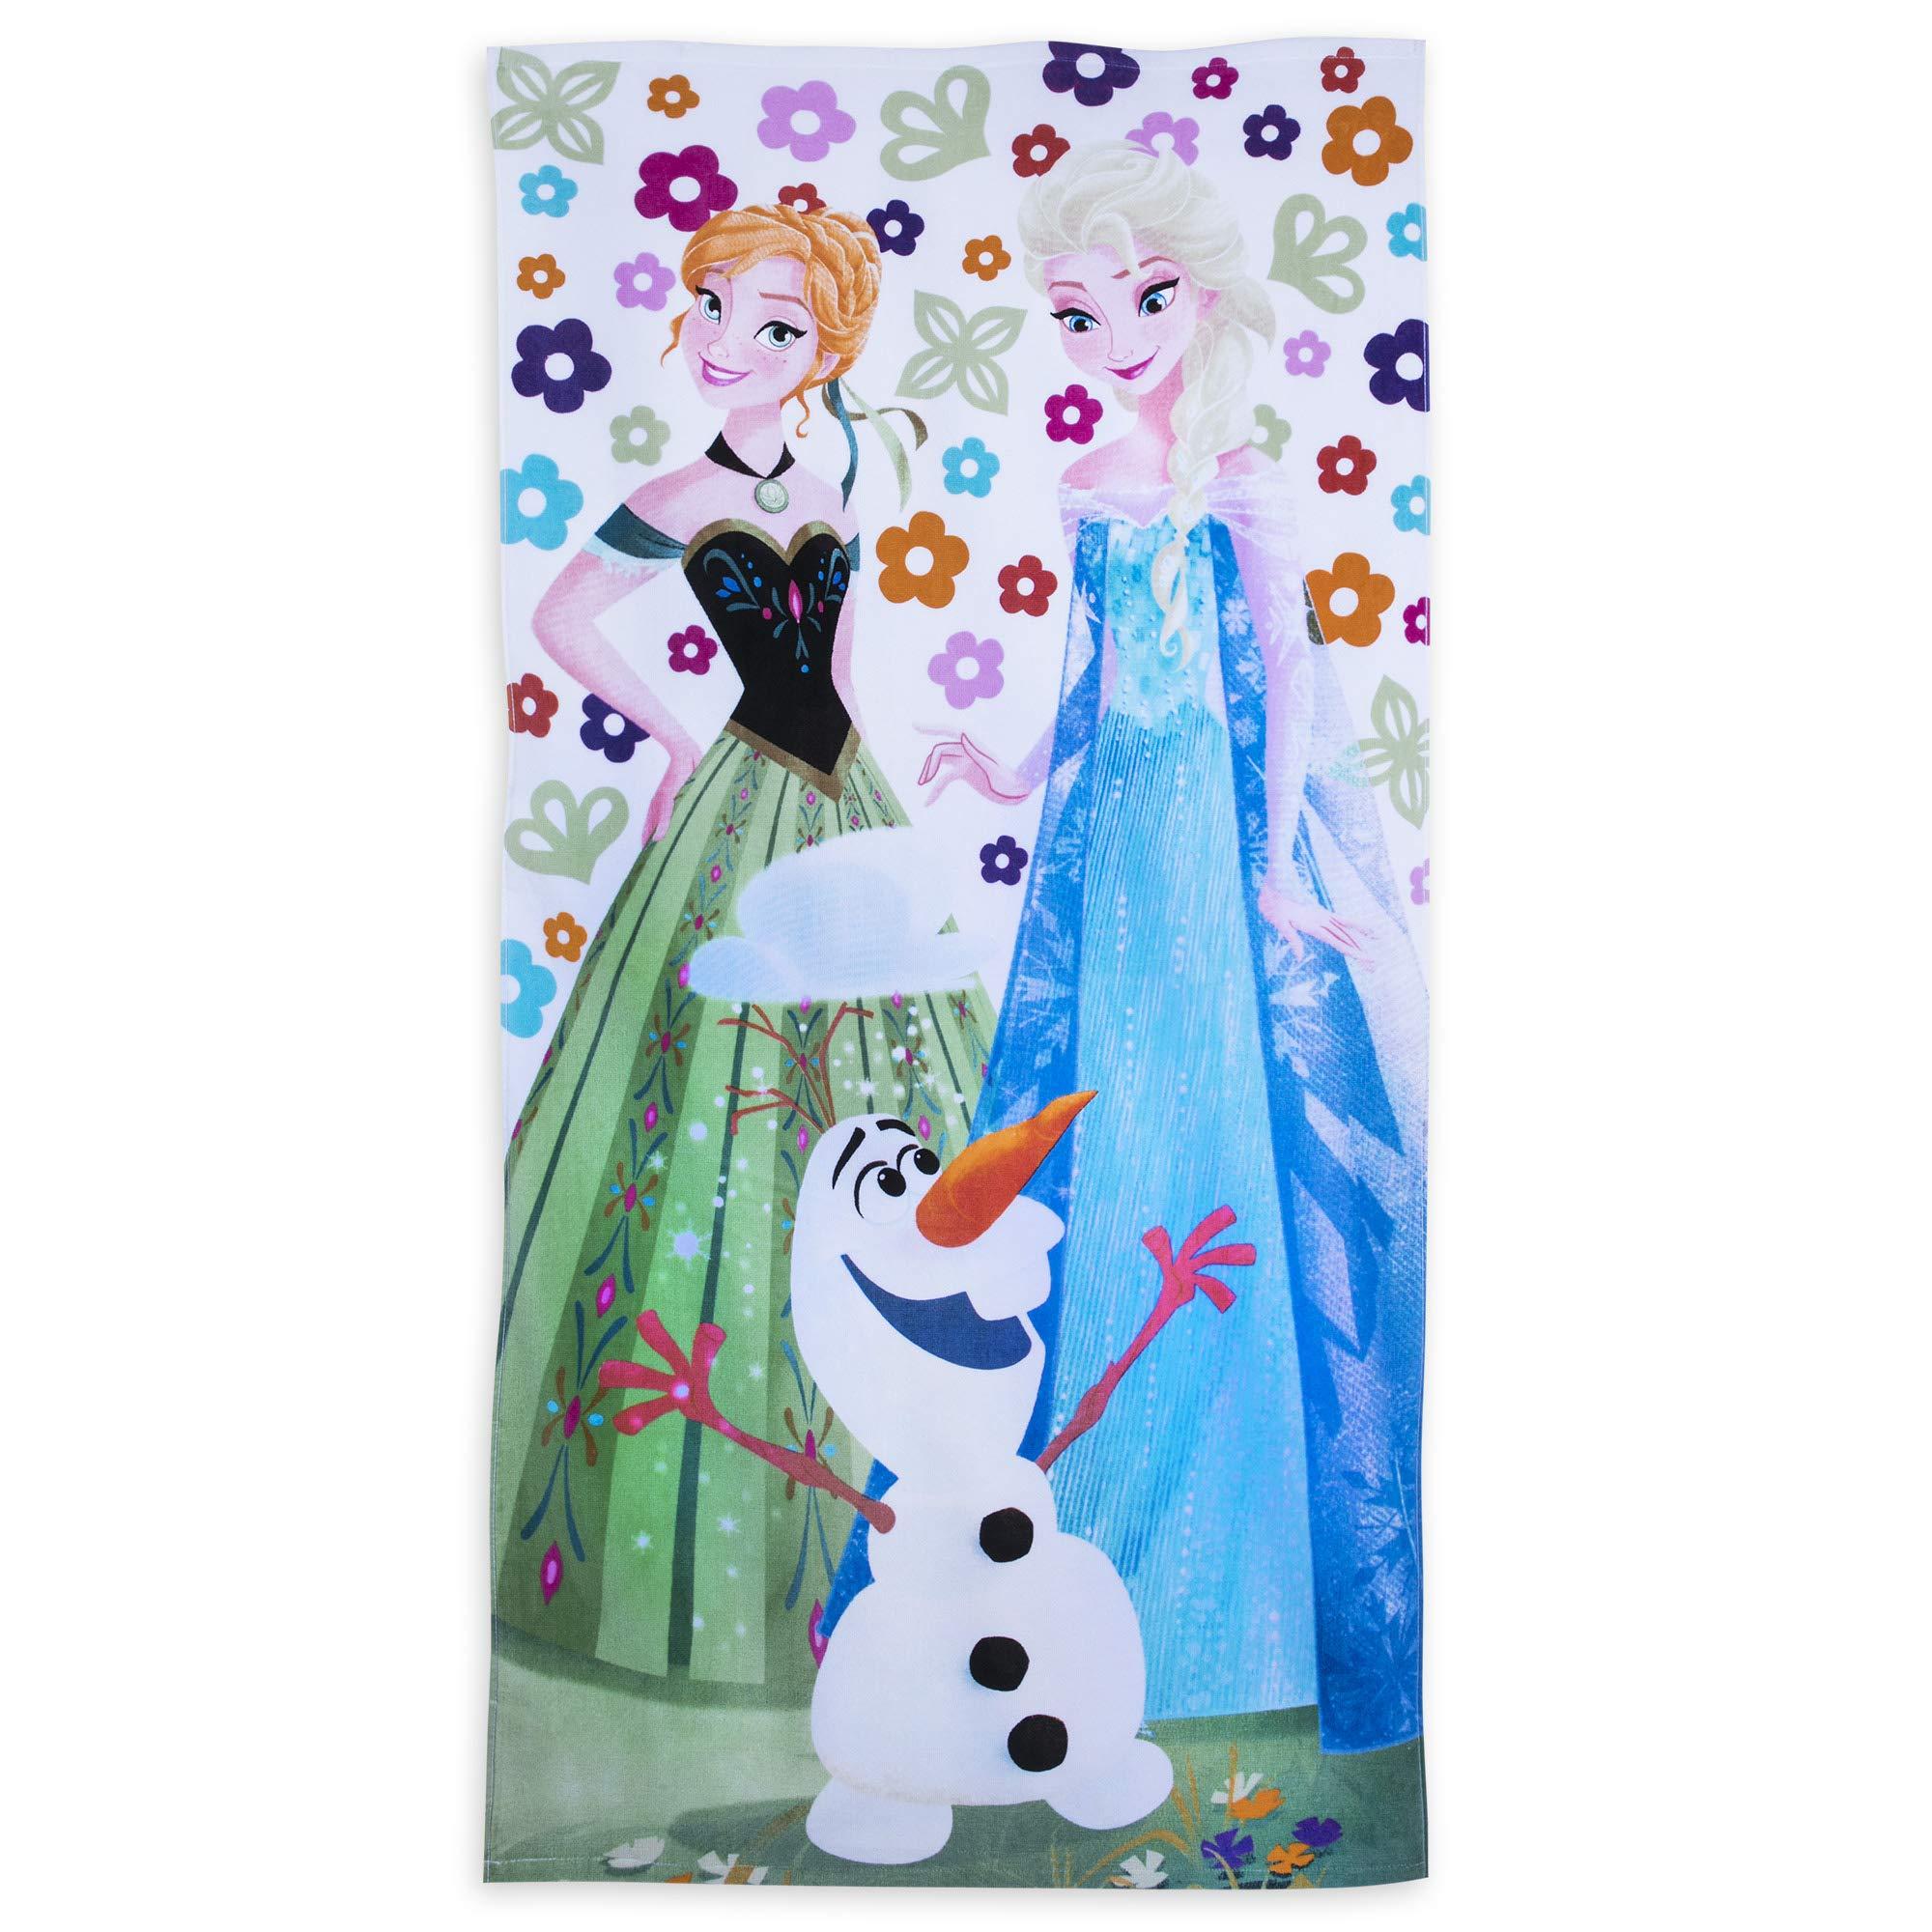 Disney Frozen Beach Towel - Multi427260210374